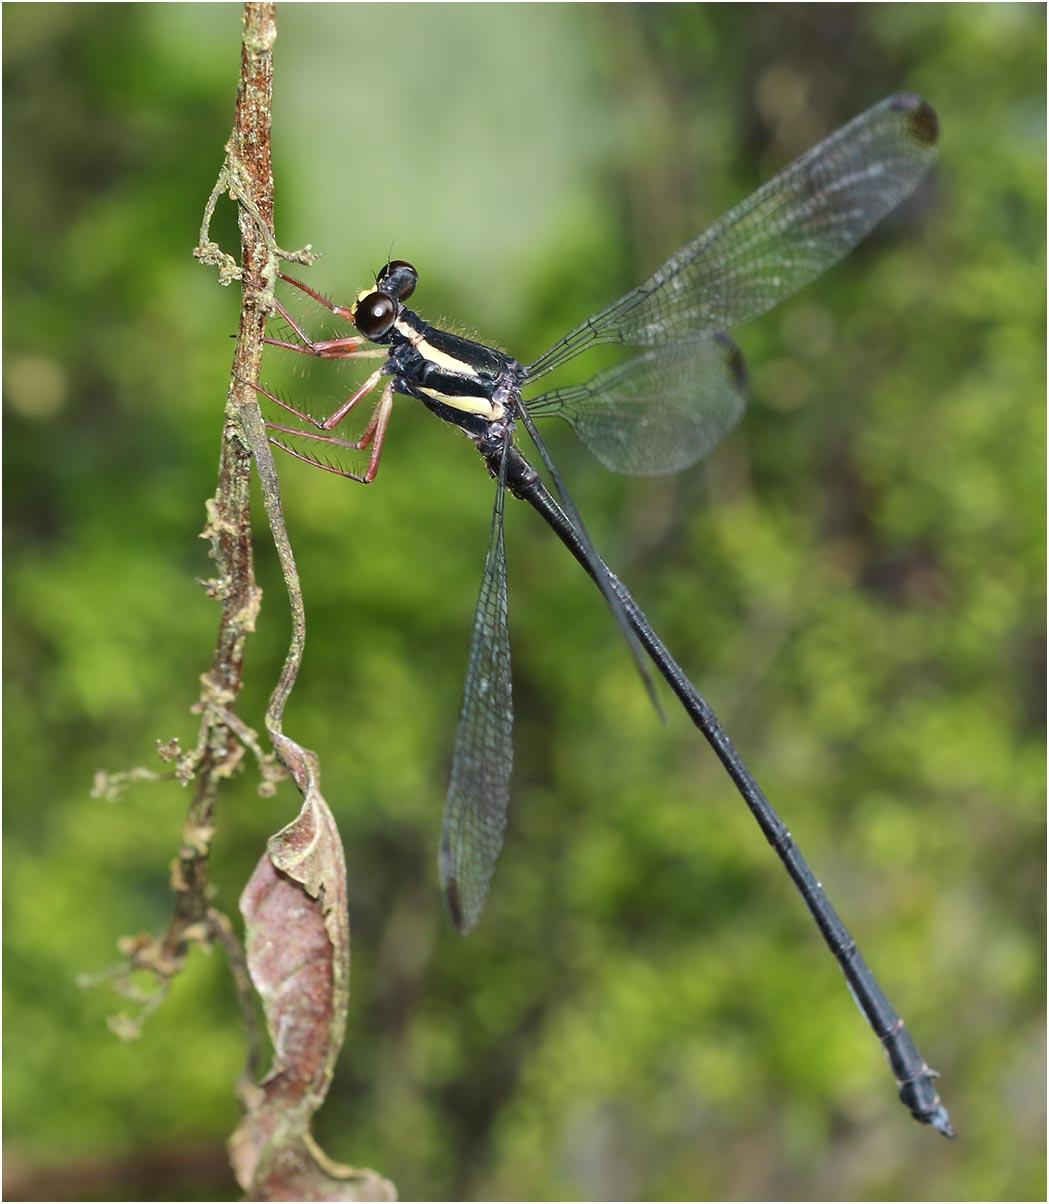 Rhipidolestes owadai mâle, Vietnam, Khau Pha, 10/06/18